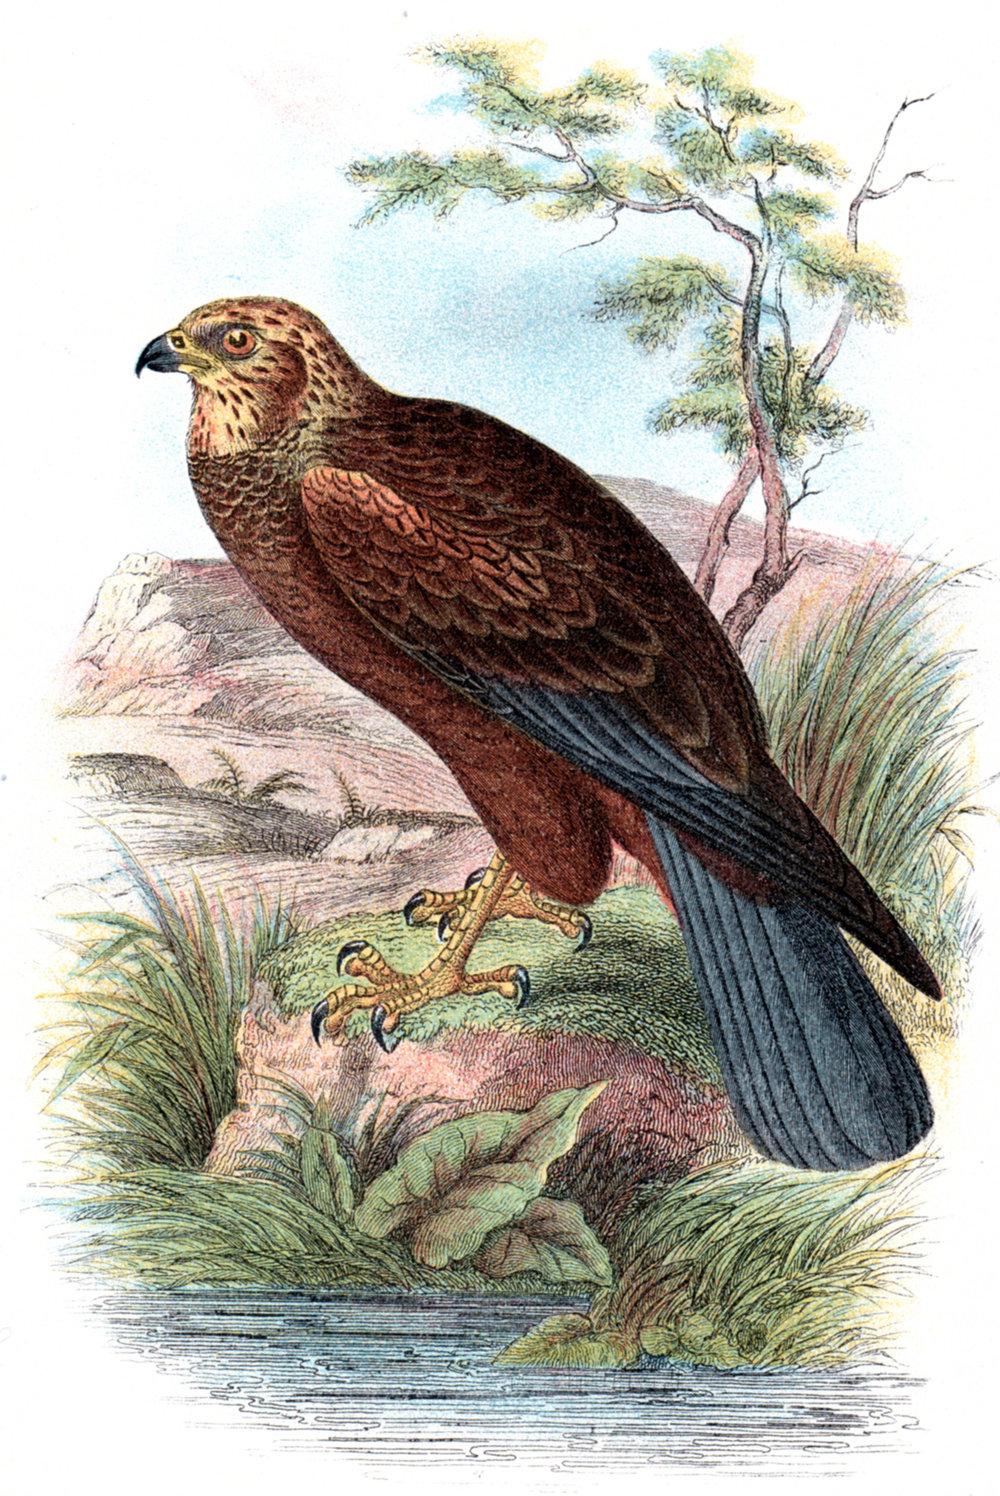 Wyman & Sons / Lloyd's Natural History